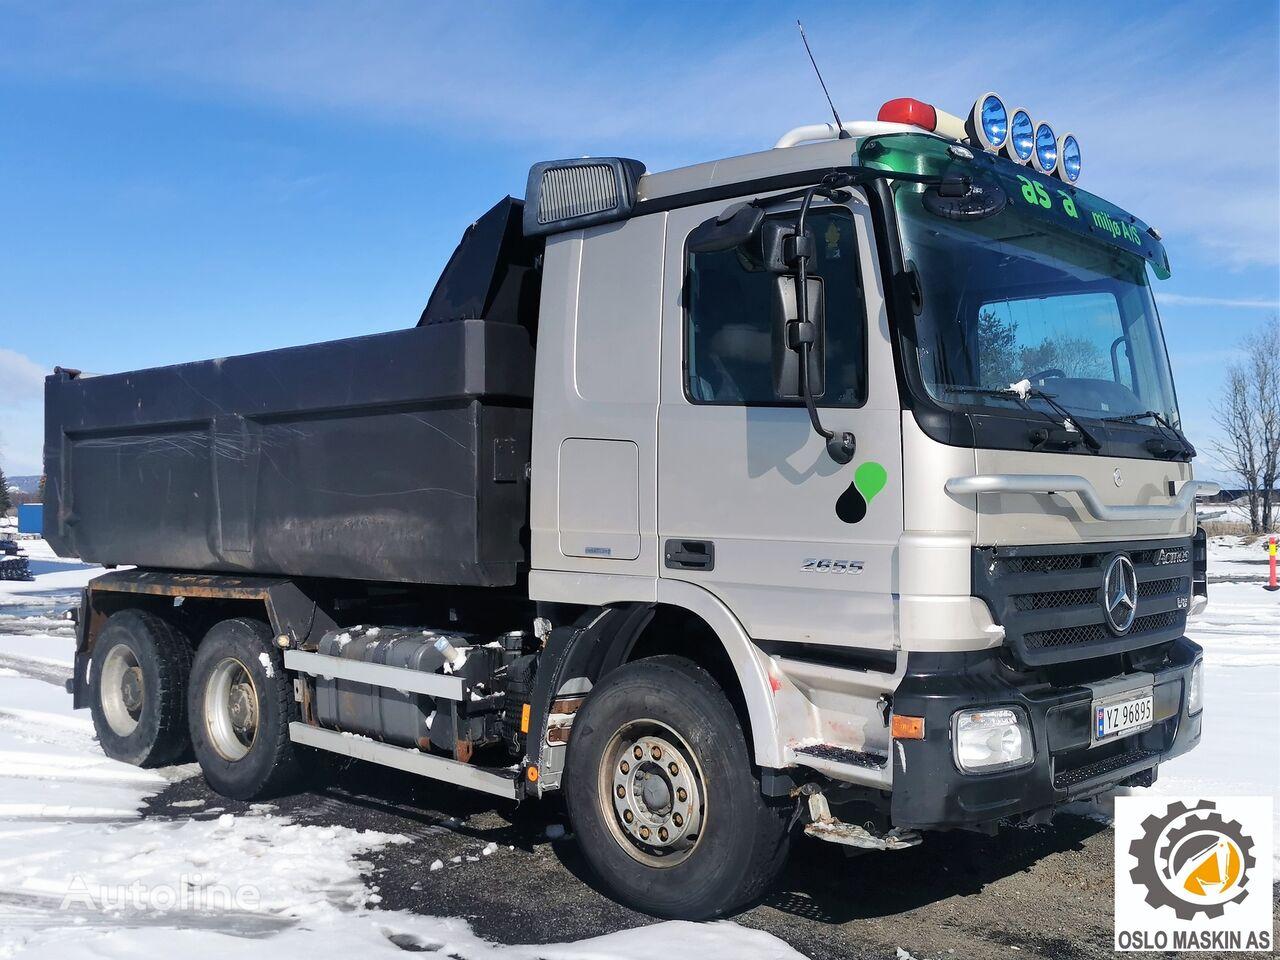 MERCEDES-BENZ ACTROS 2655, 6x4, V8, km. 274000  dump truck